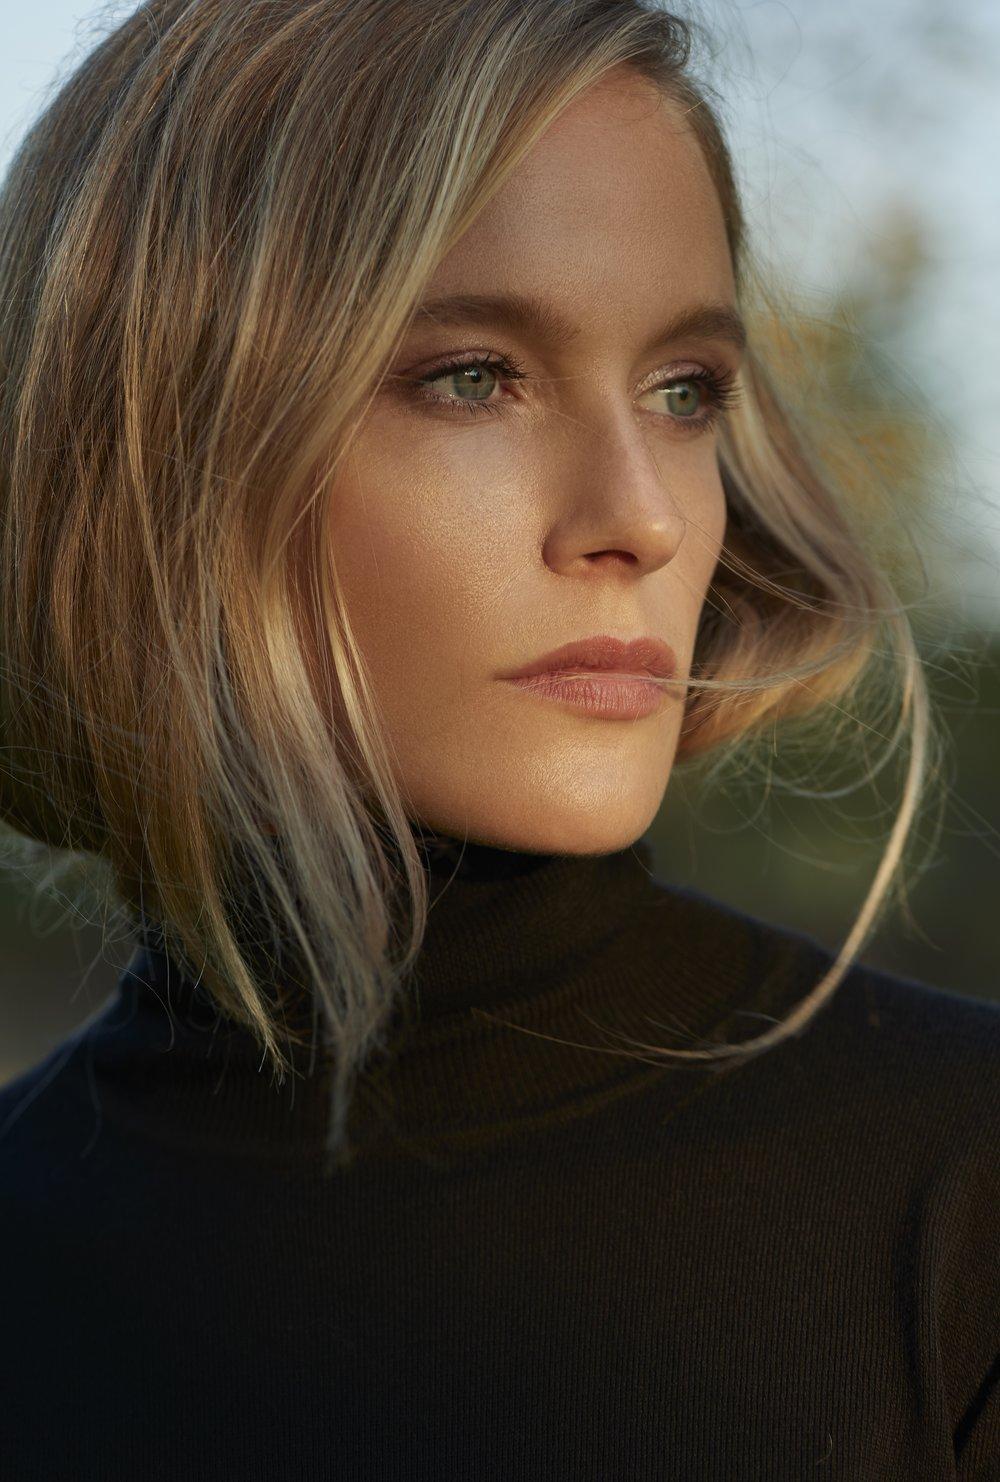 Annabell Ratter by Eva Schwank